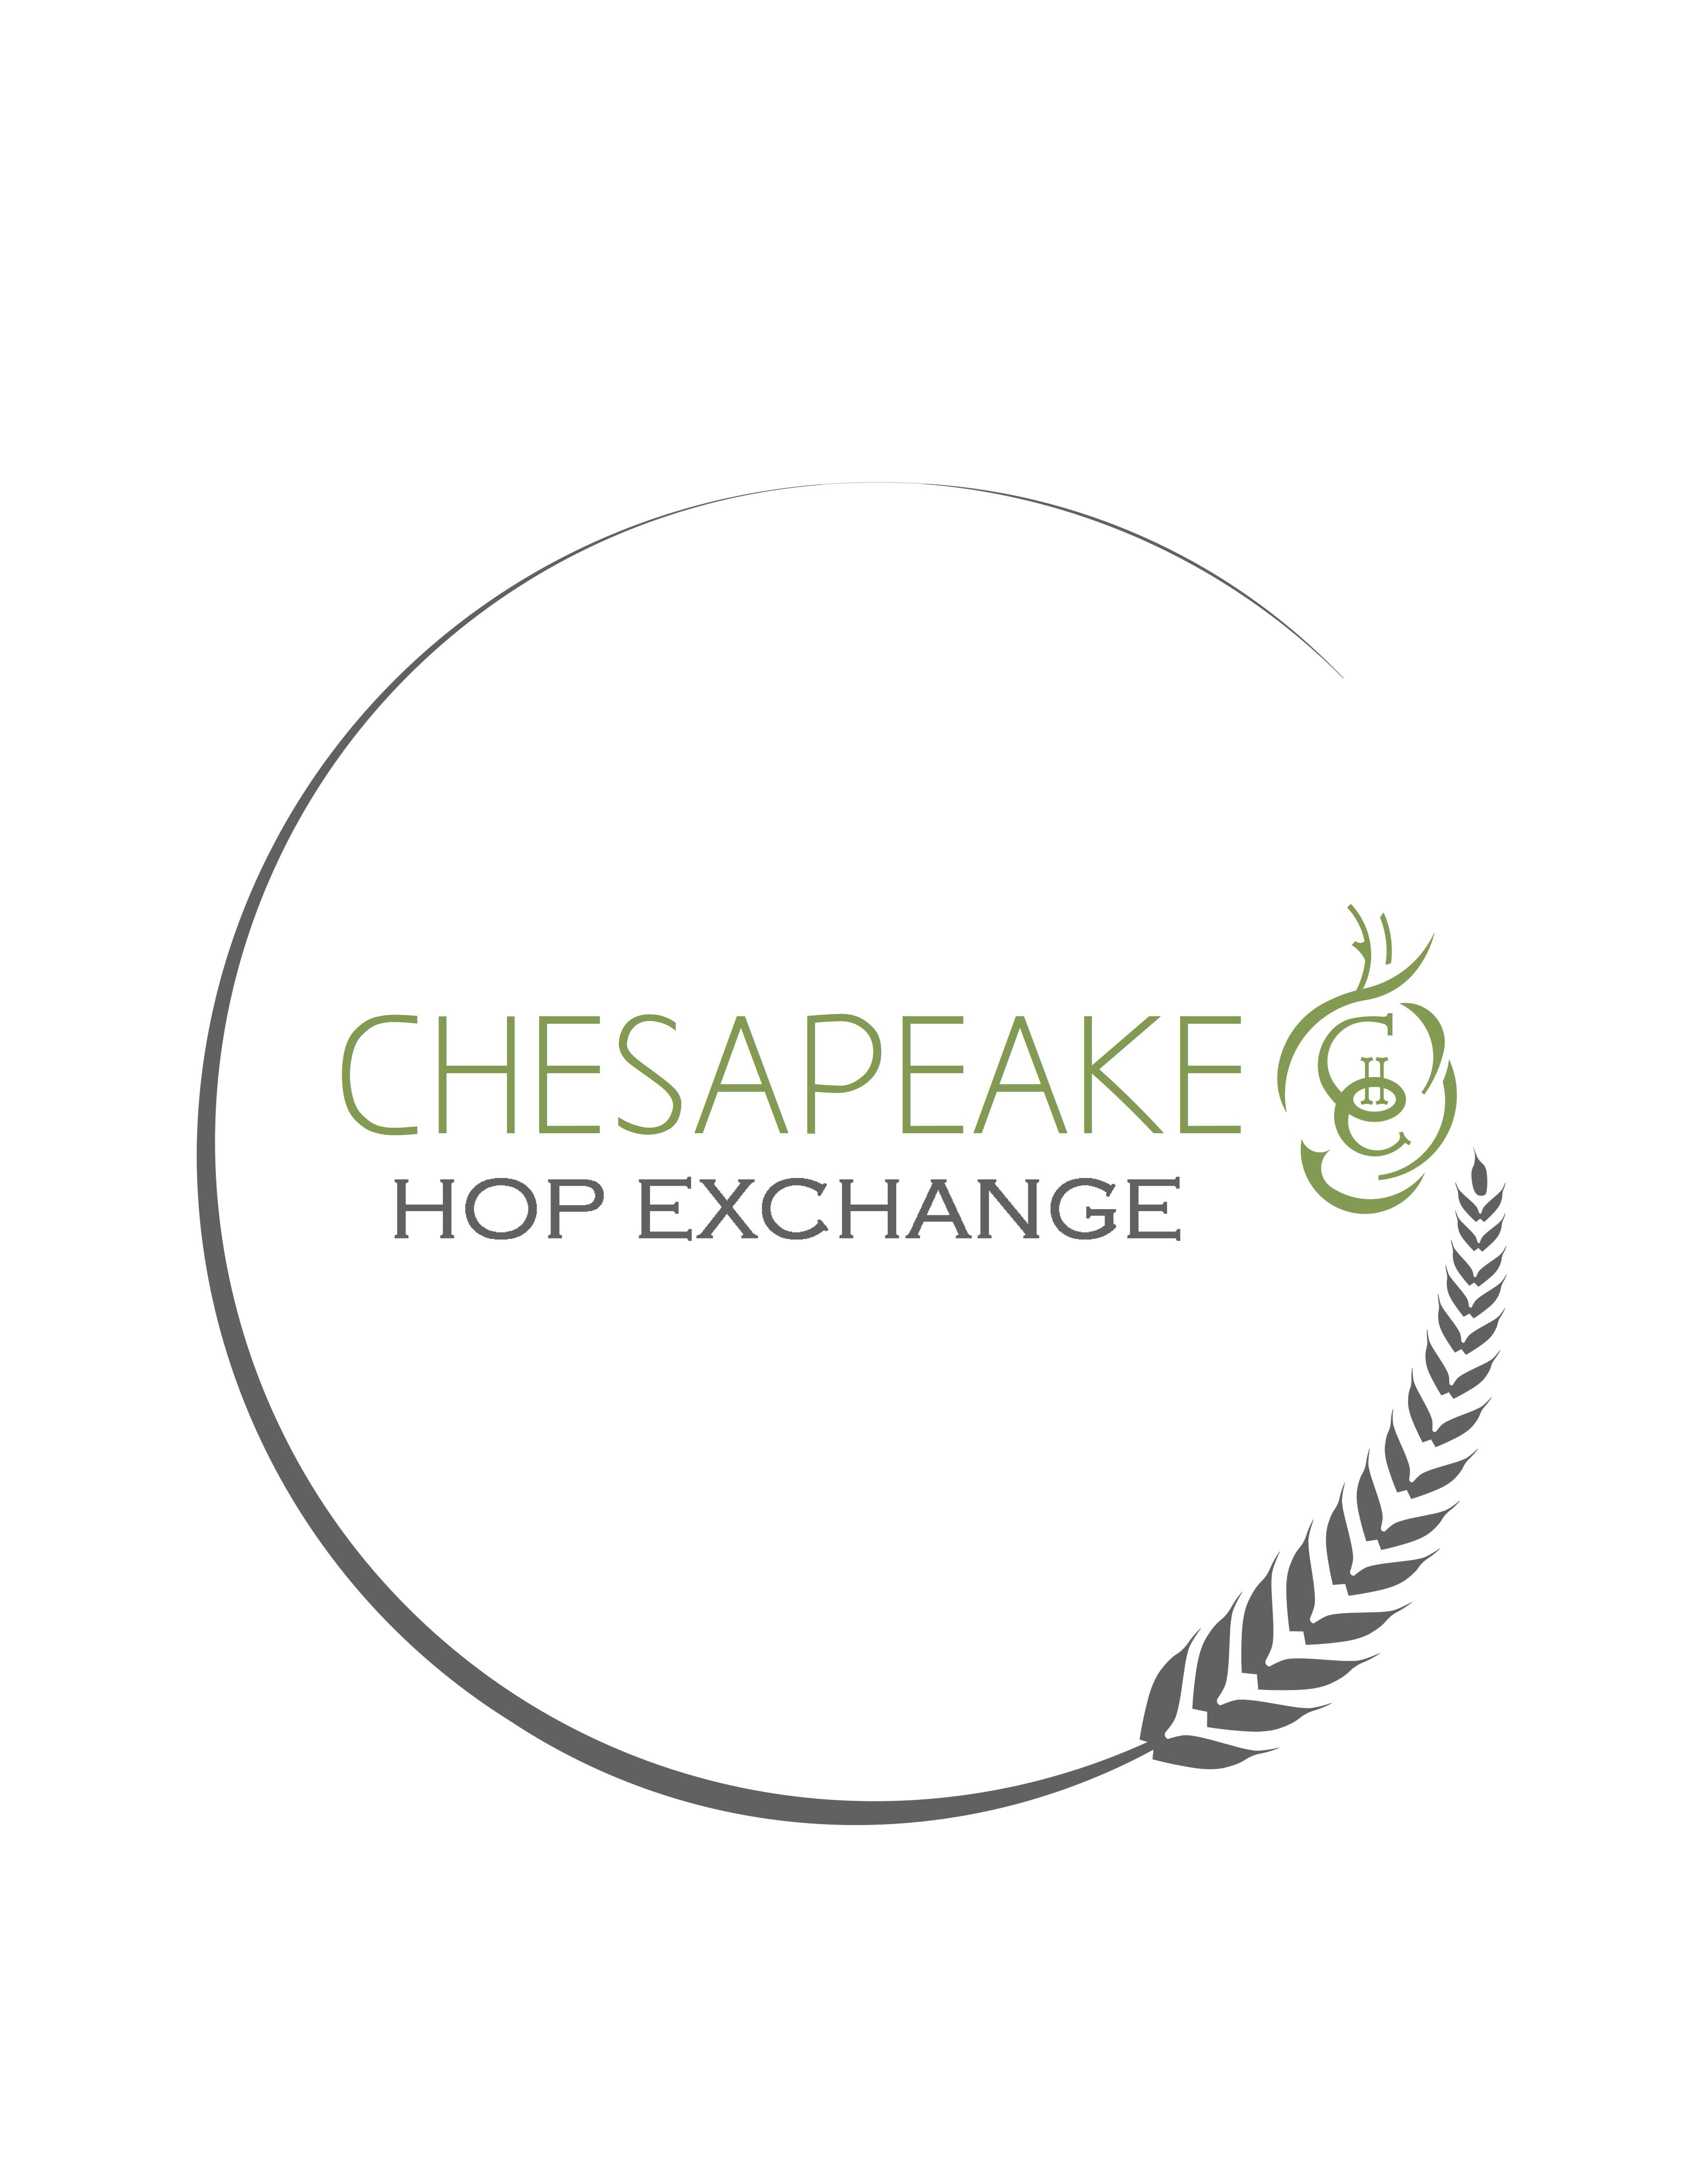 Chesapeake Hop Exchange